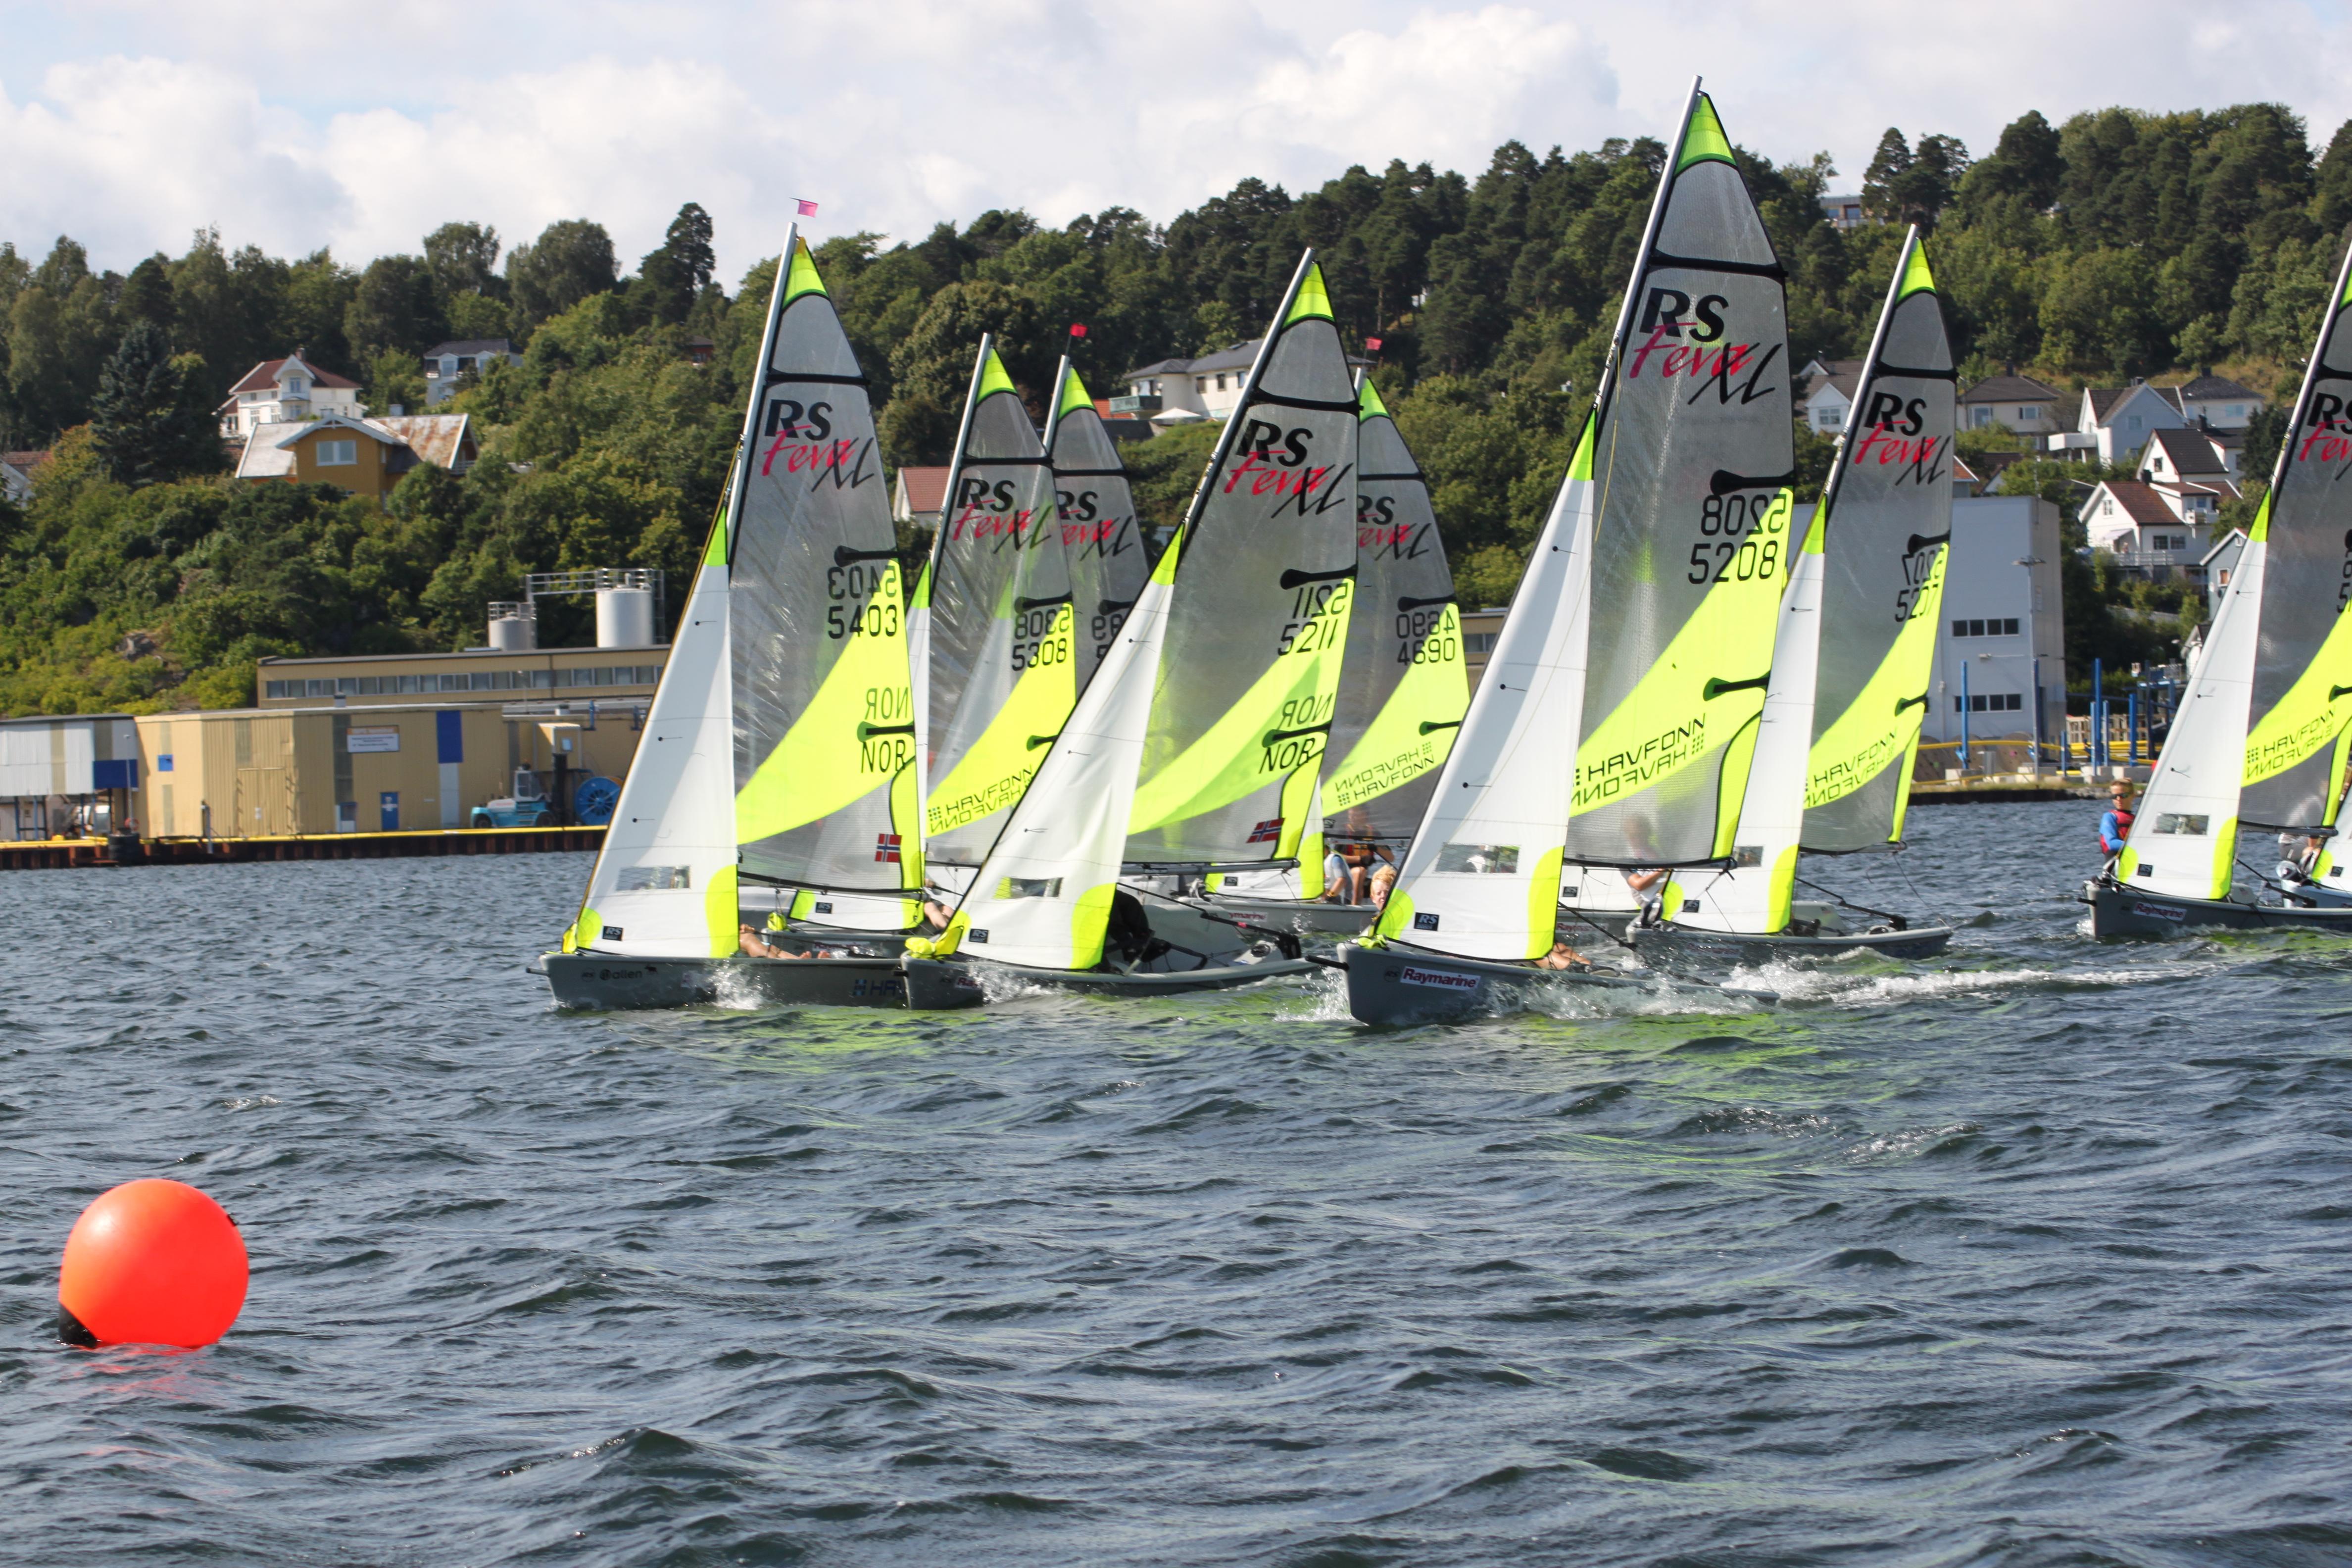 Moss raymarine race13